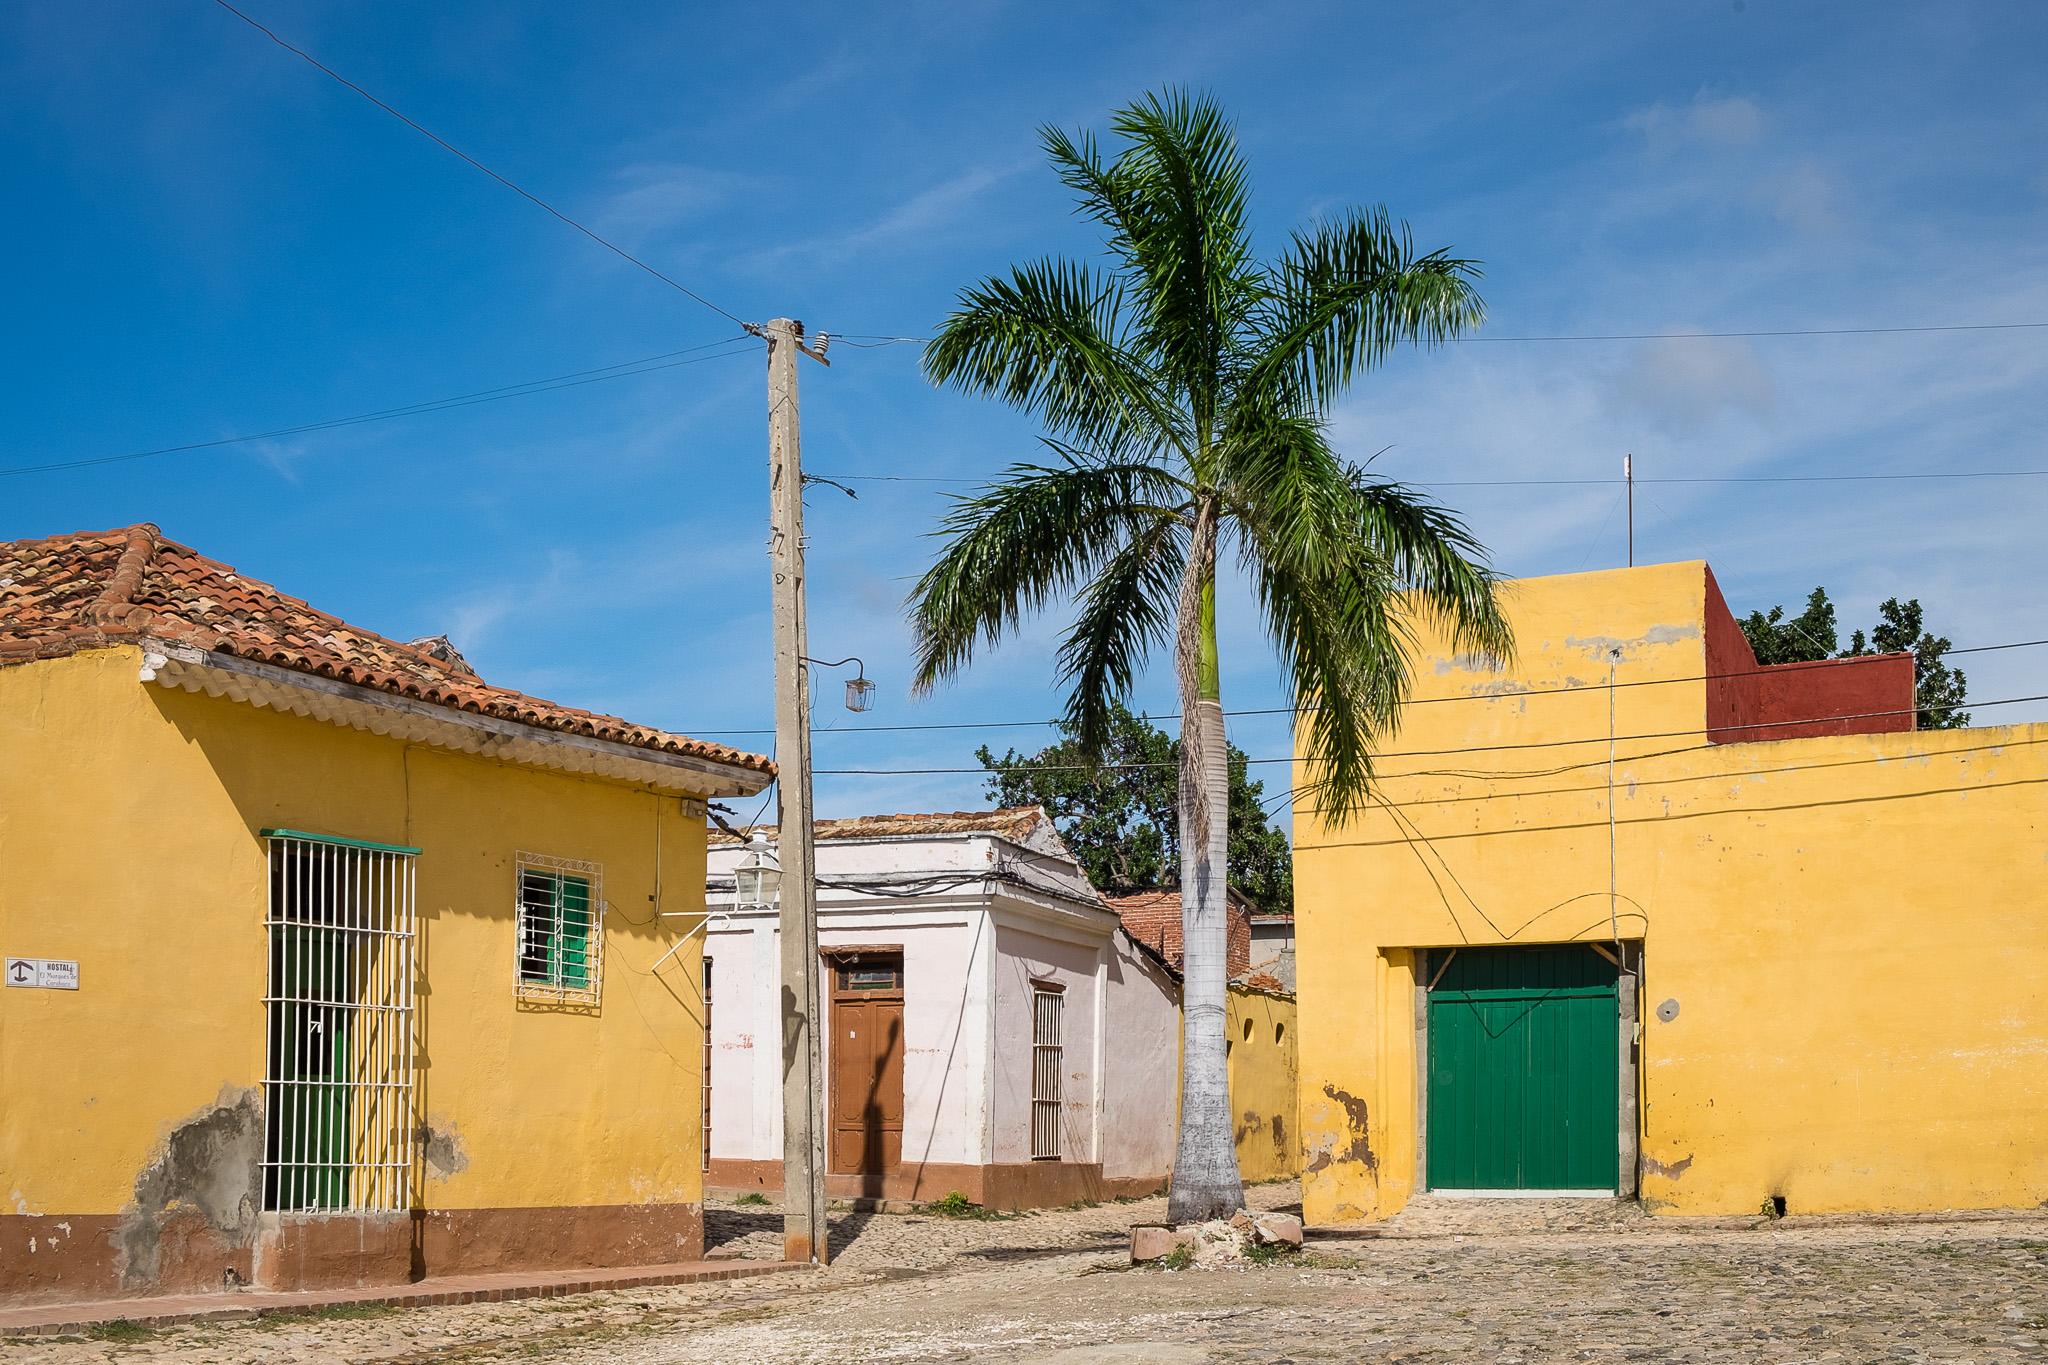 Cuba-2017-12-Trinidad-0316.jpg